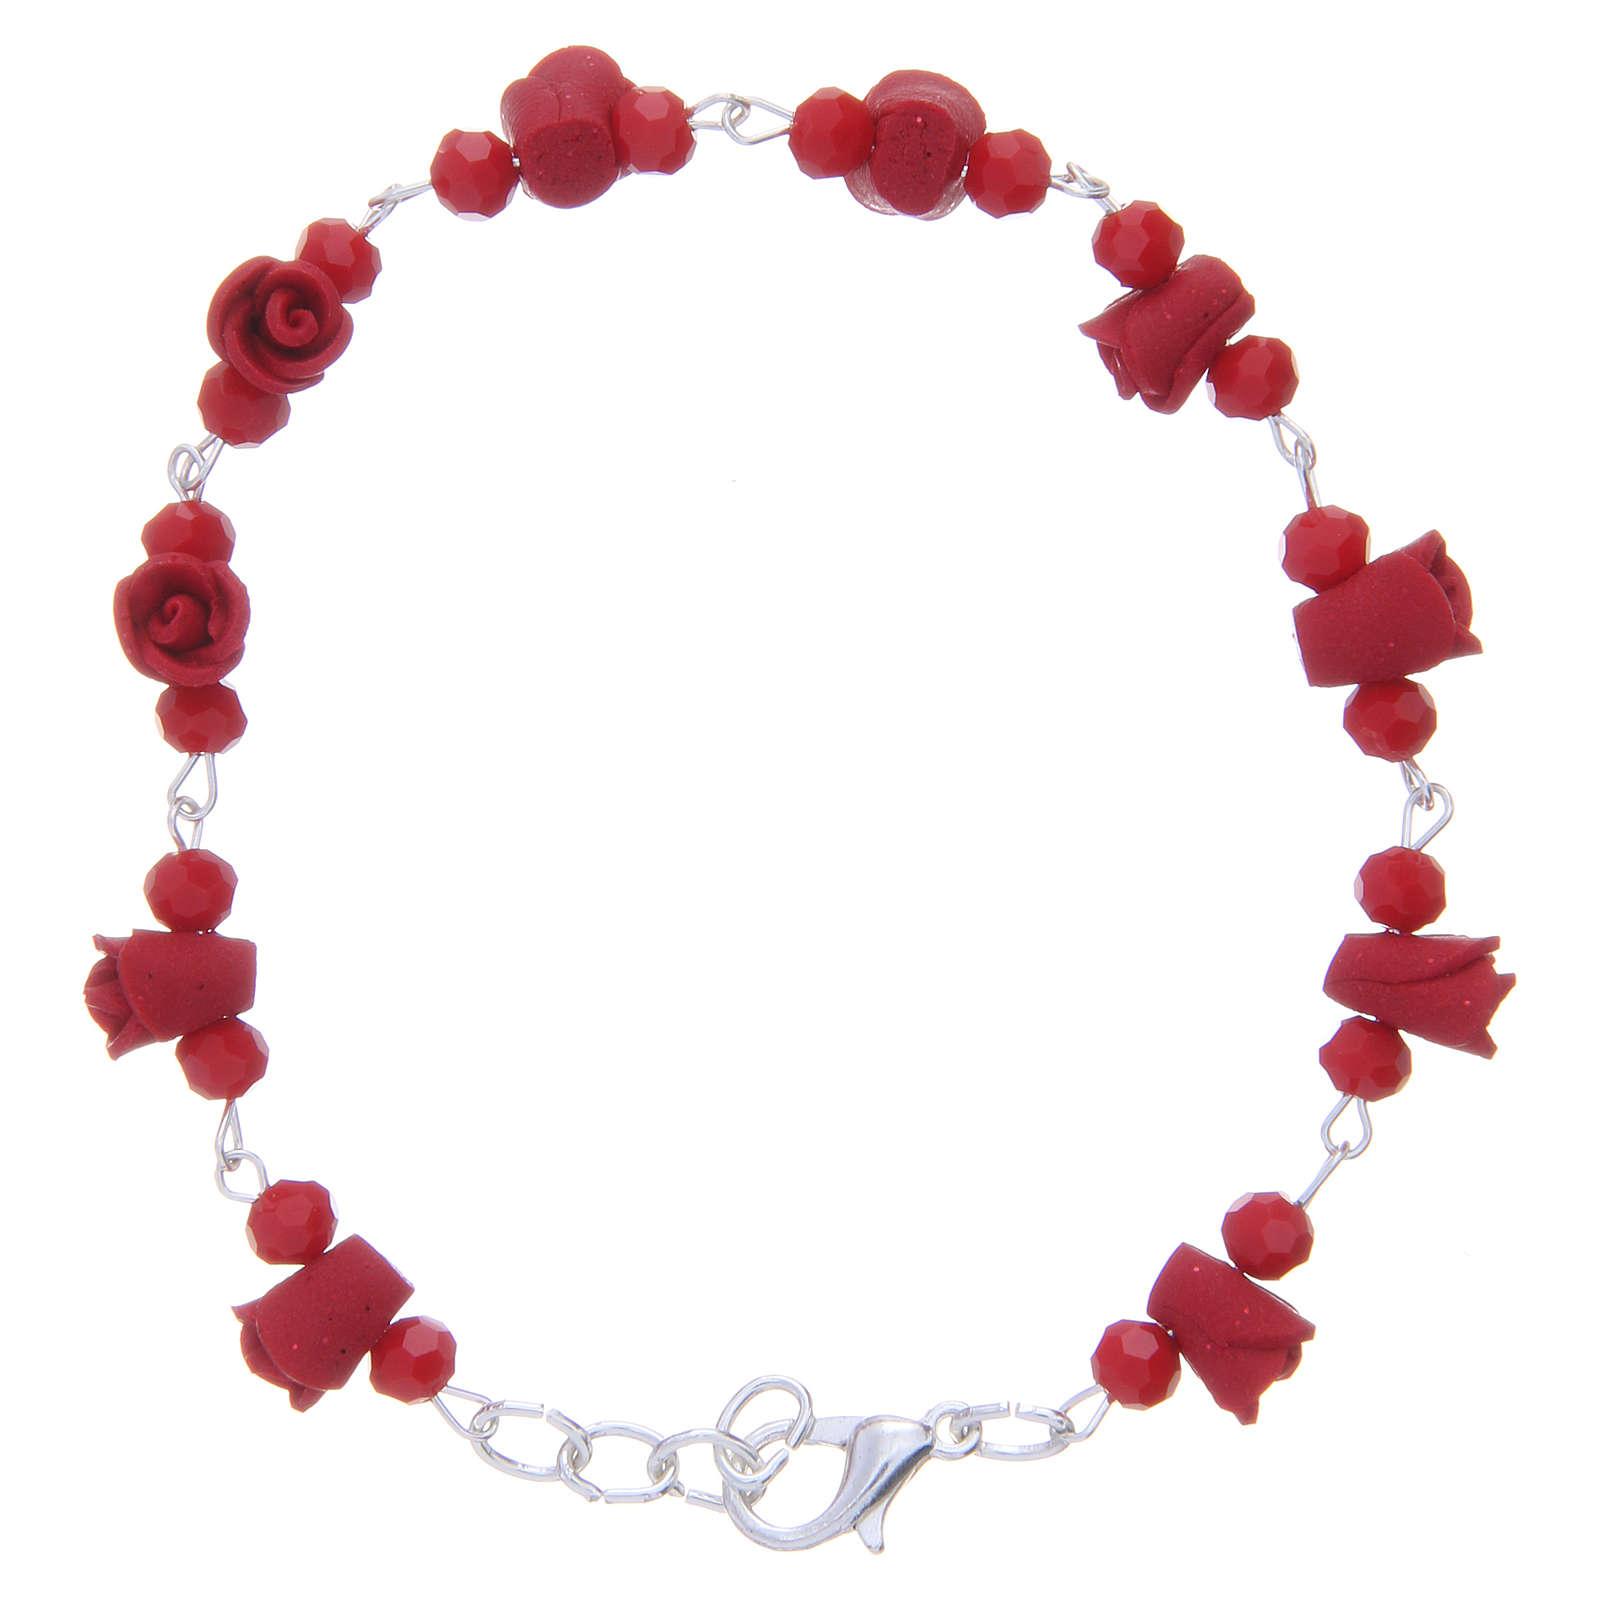 Pulsera Medjugorje rojo rosas cerámica cuentas cristal 4